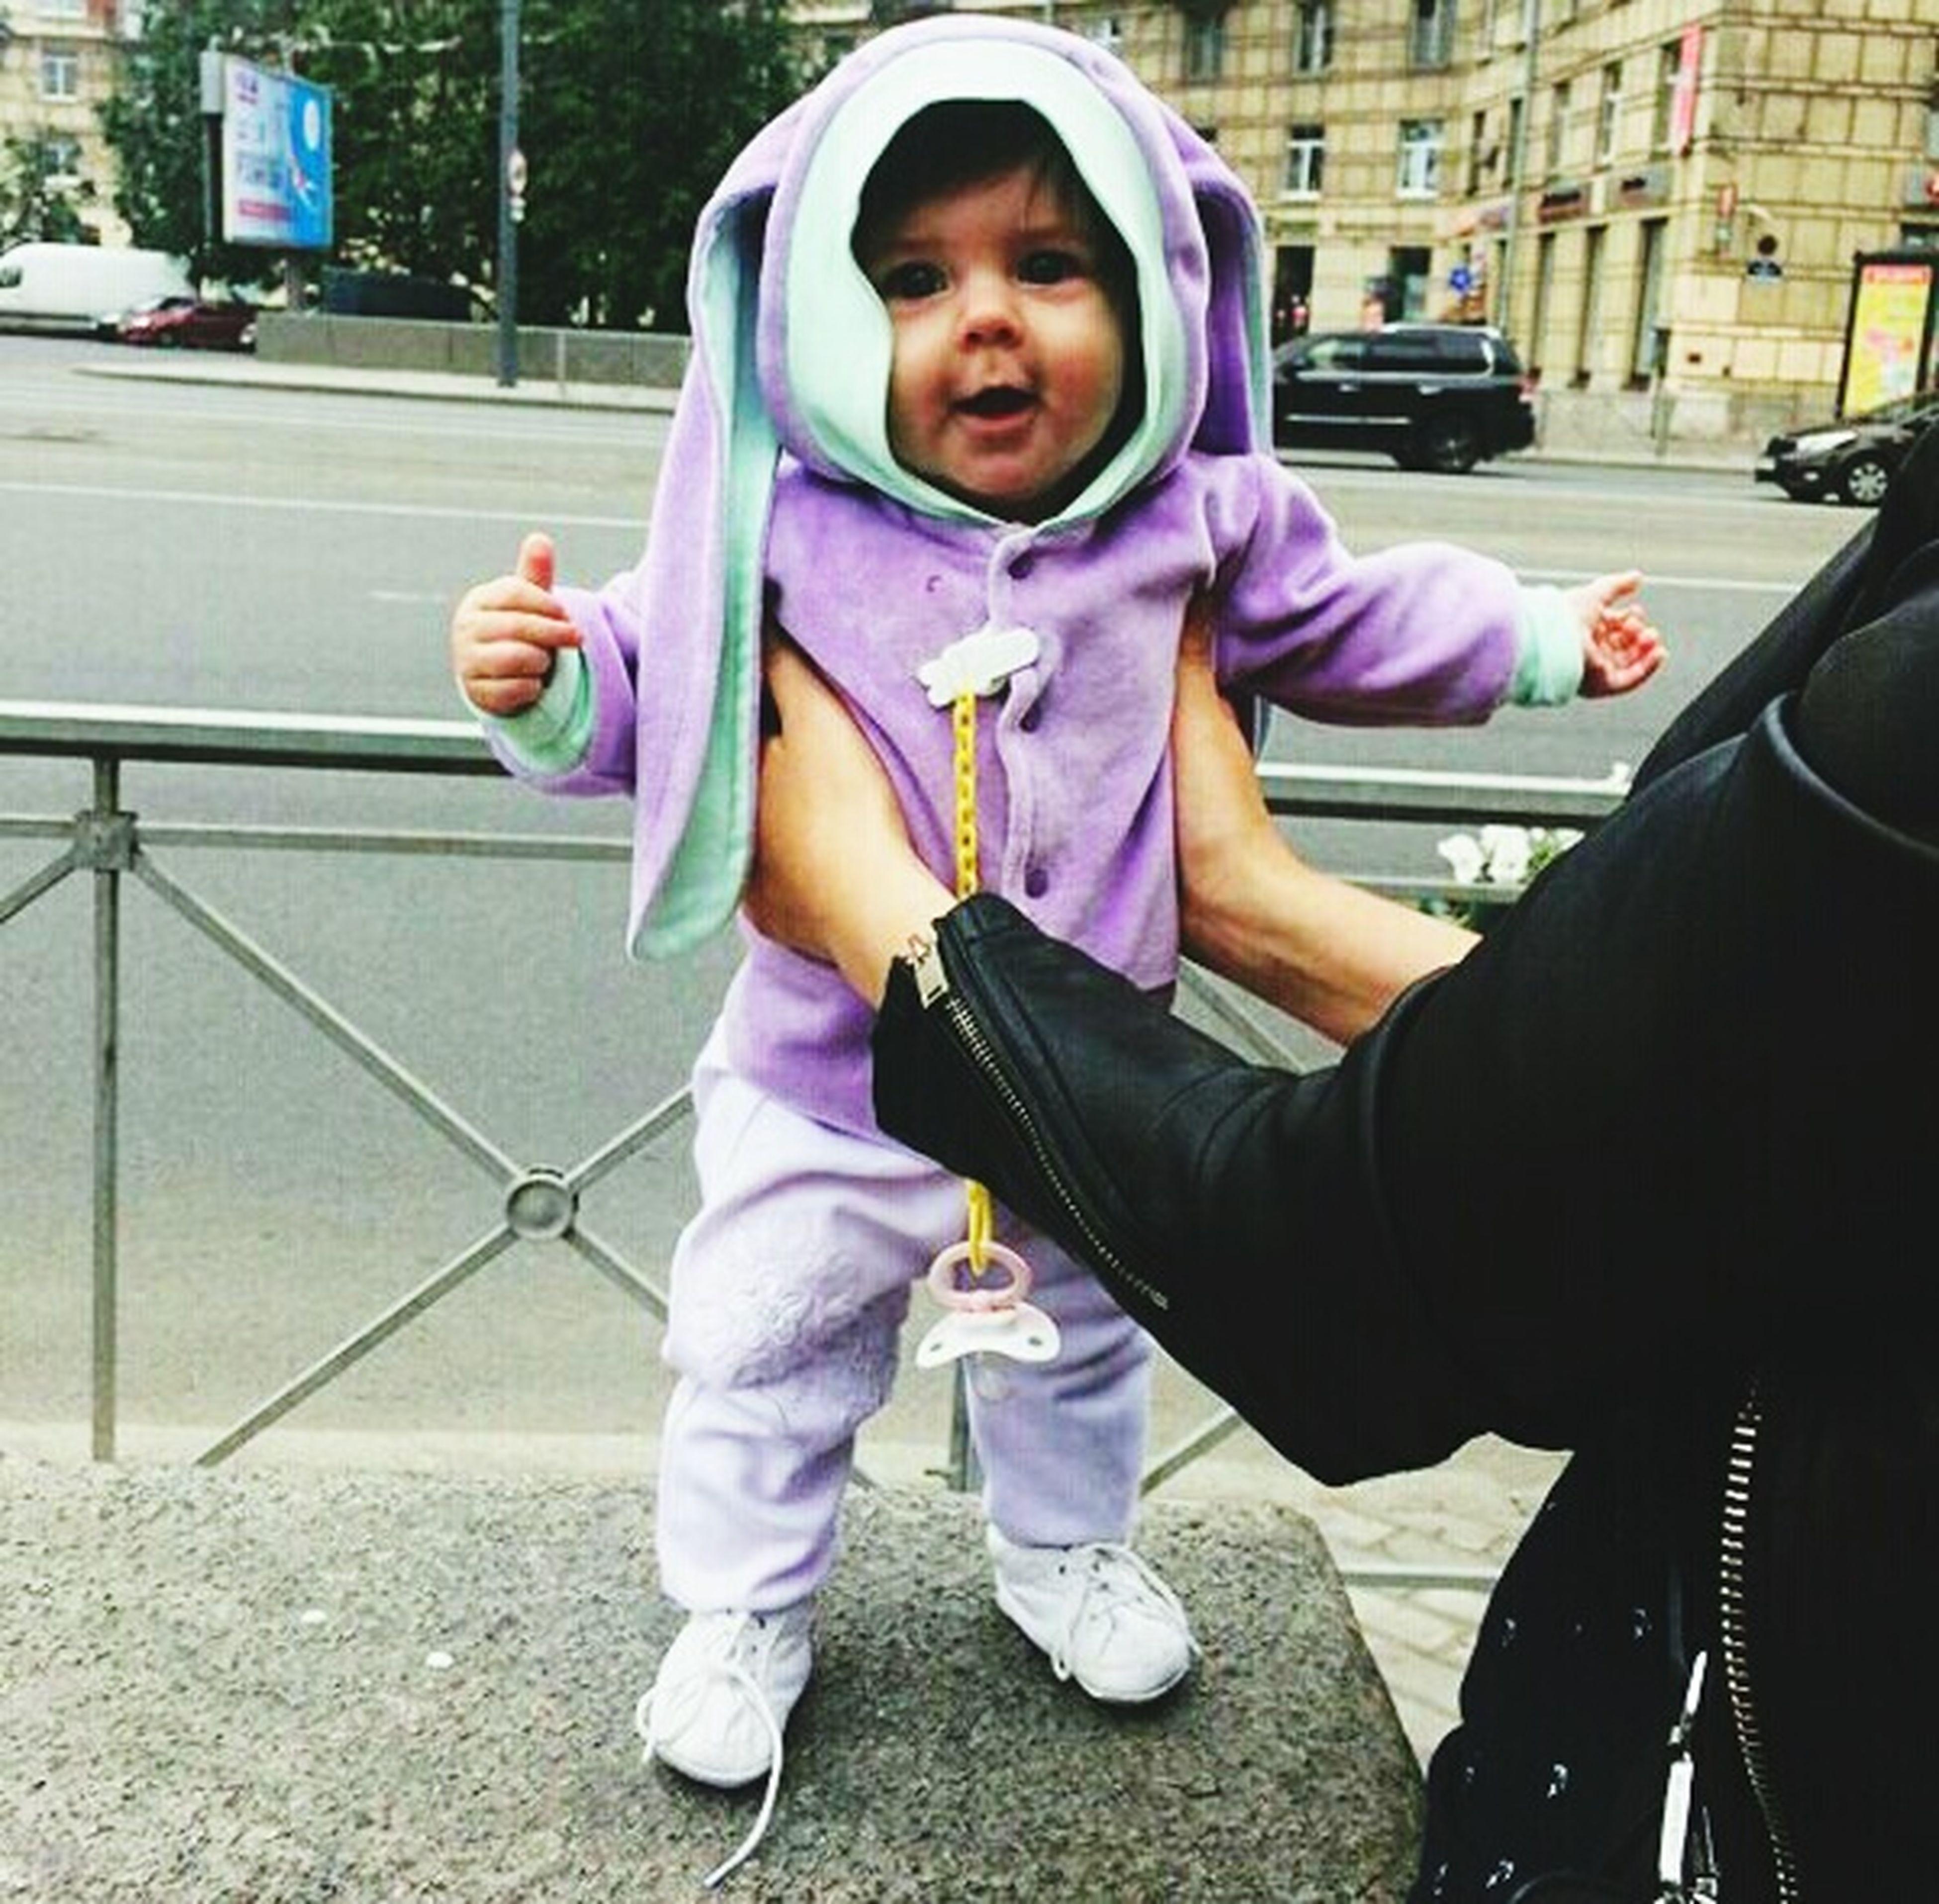 Зайка растет😊😍😱😎💗🐰🐾⛅ Girls Child Childhood City Love Niece 💕 Vacations Bunny 🐰 Lifestyles Summer MyPrincess💕 5monthsold Sister ❤ Happy Hour Day Fiststep First Eyeem Photo